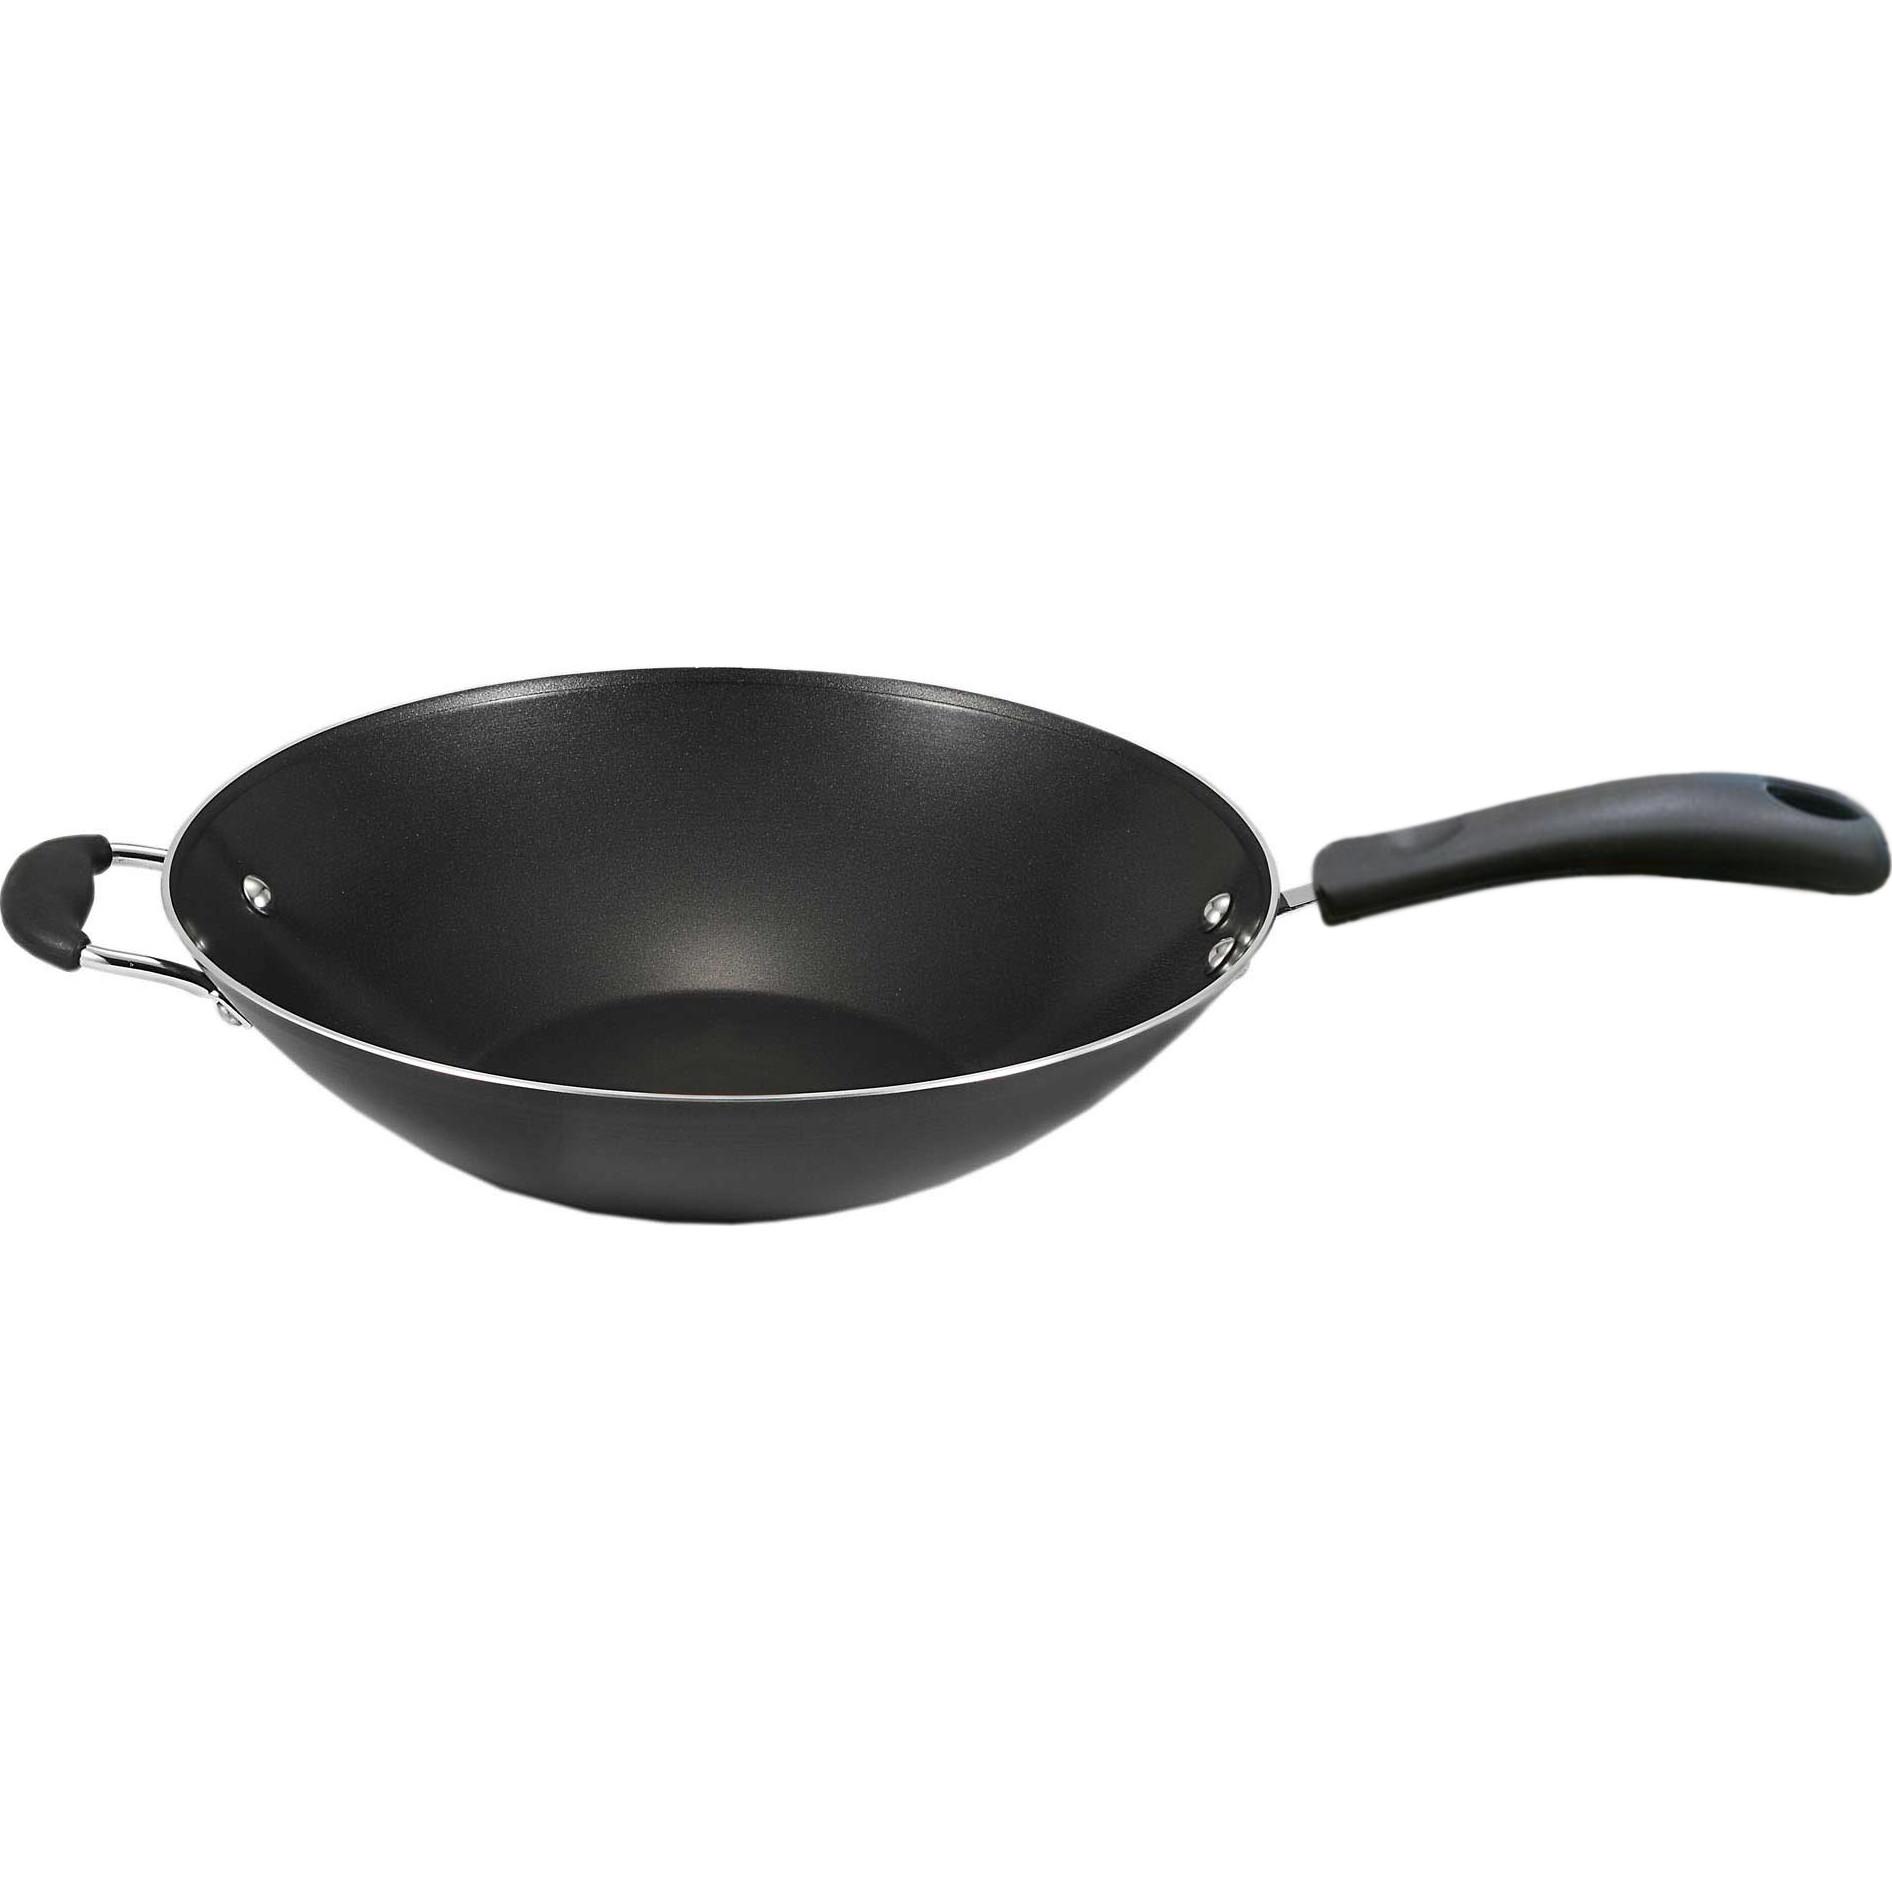 "T-fal, Easy Care Nonstick, B15089, Dishwasher Safe Cookware, 14"" Jumbo Wok, Black"